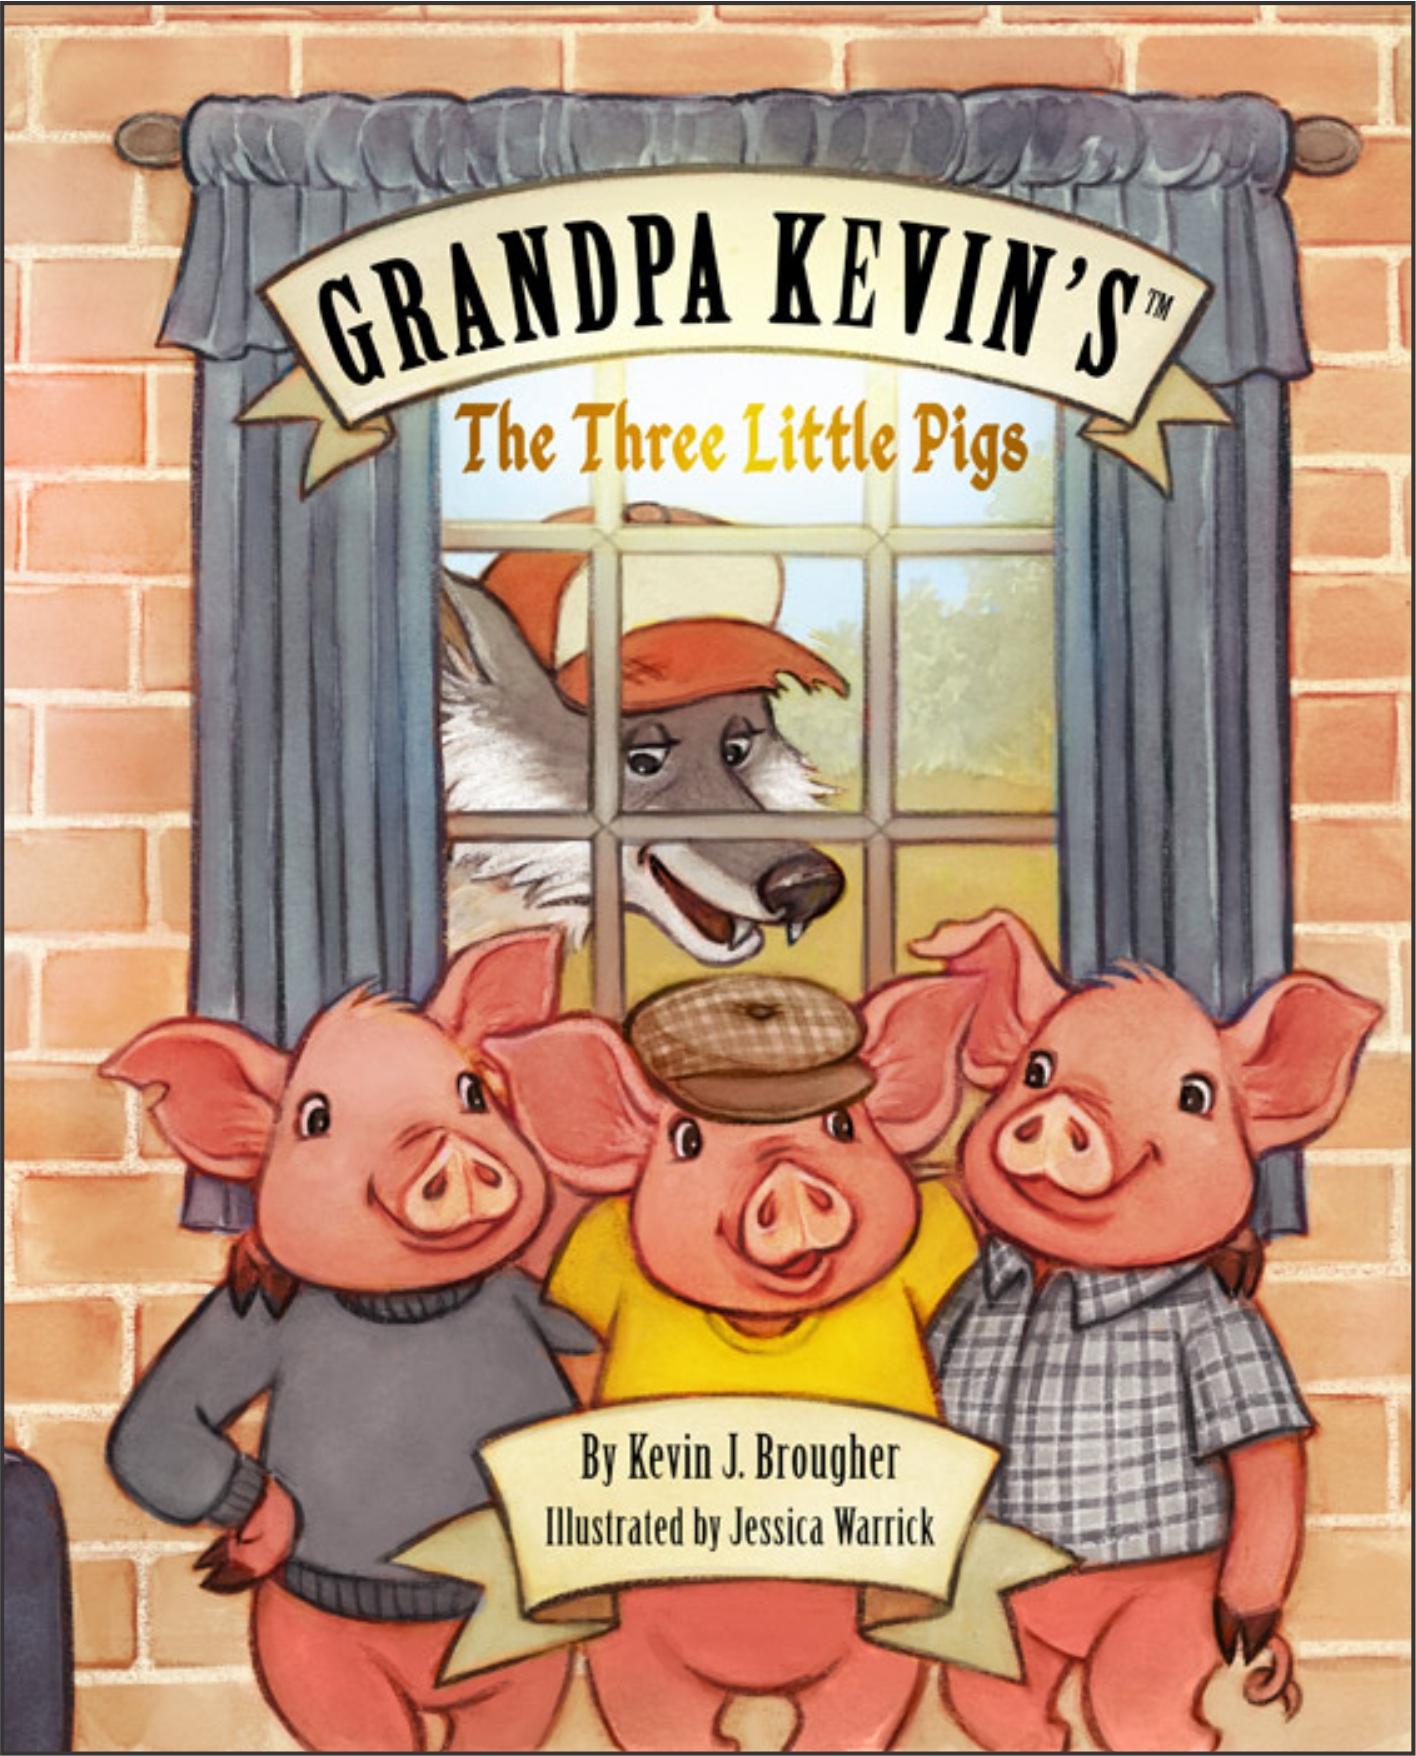 Grandpa Kevin's Book Series